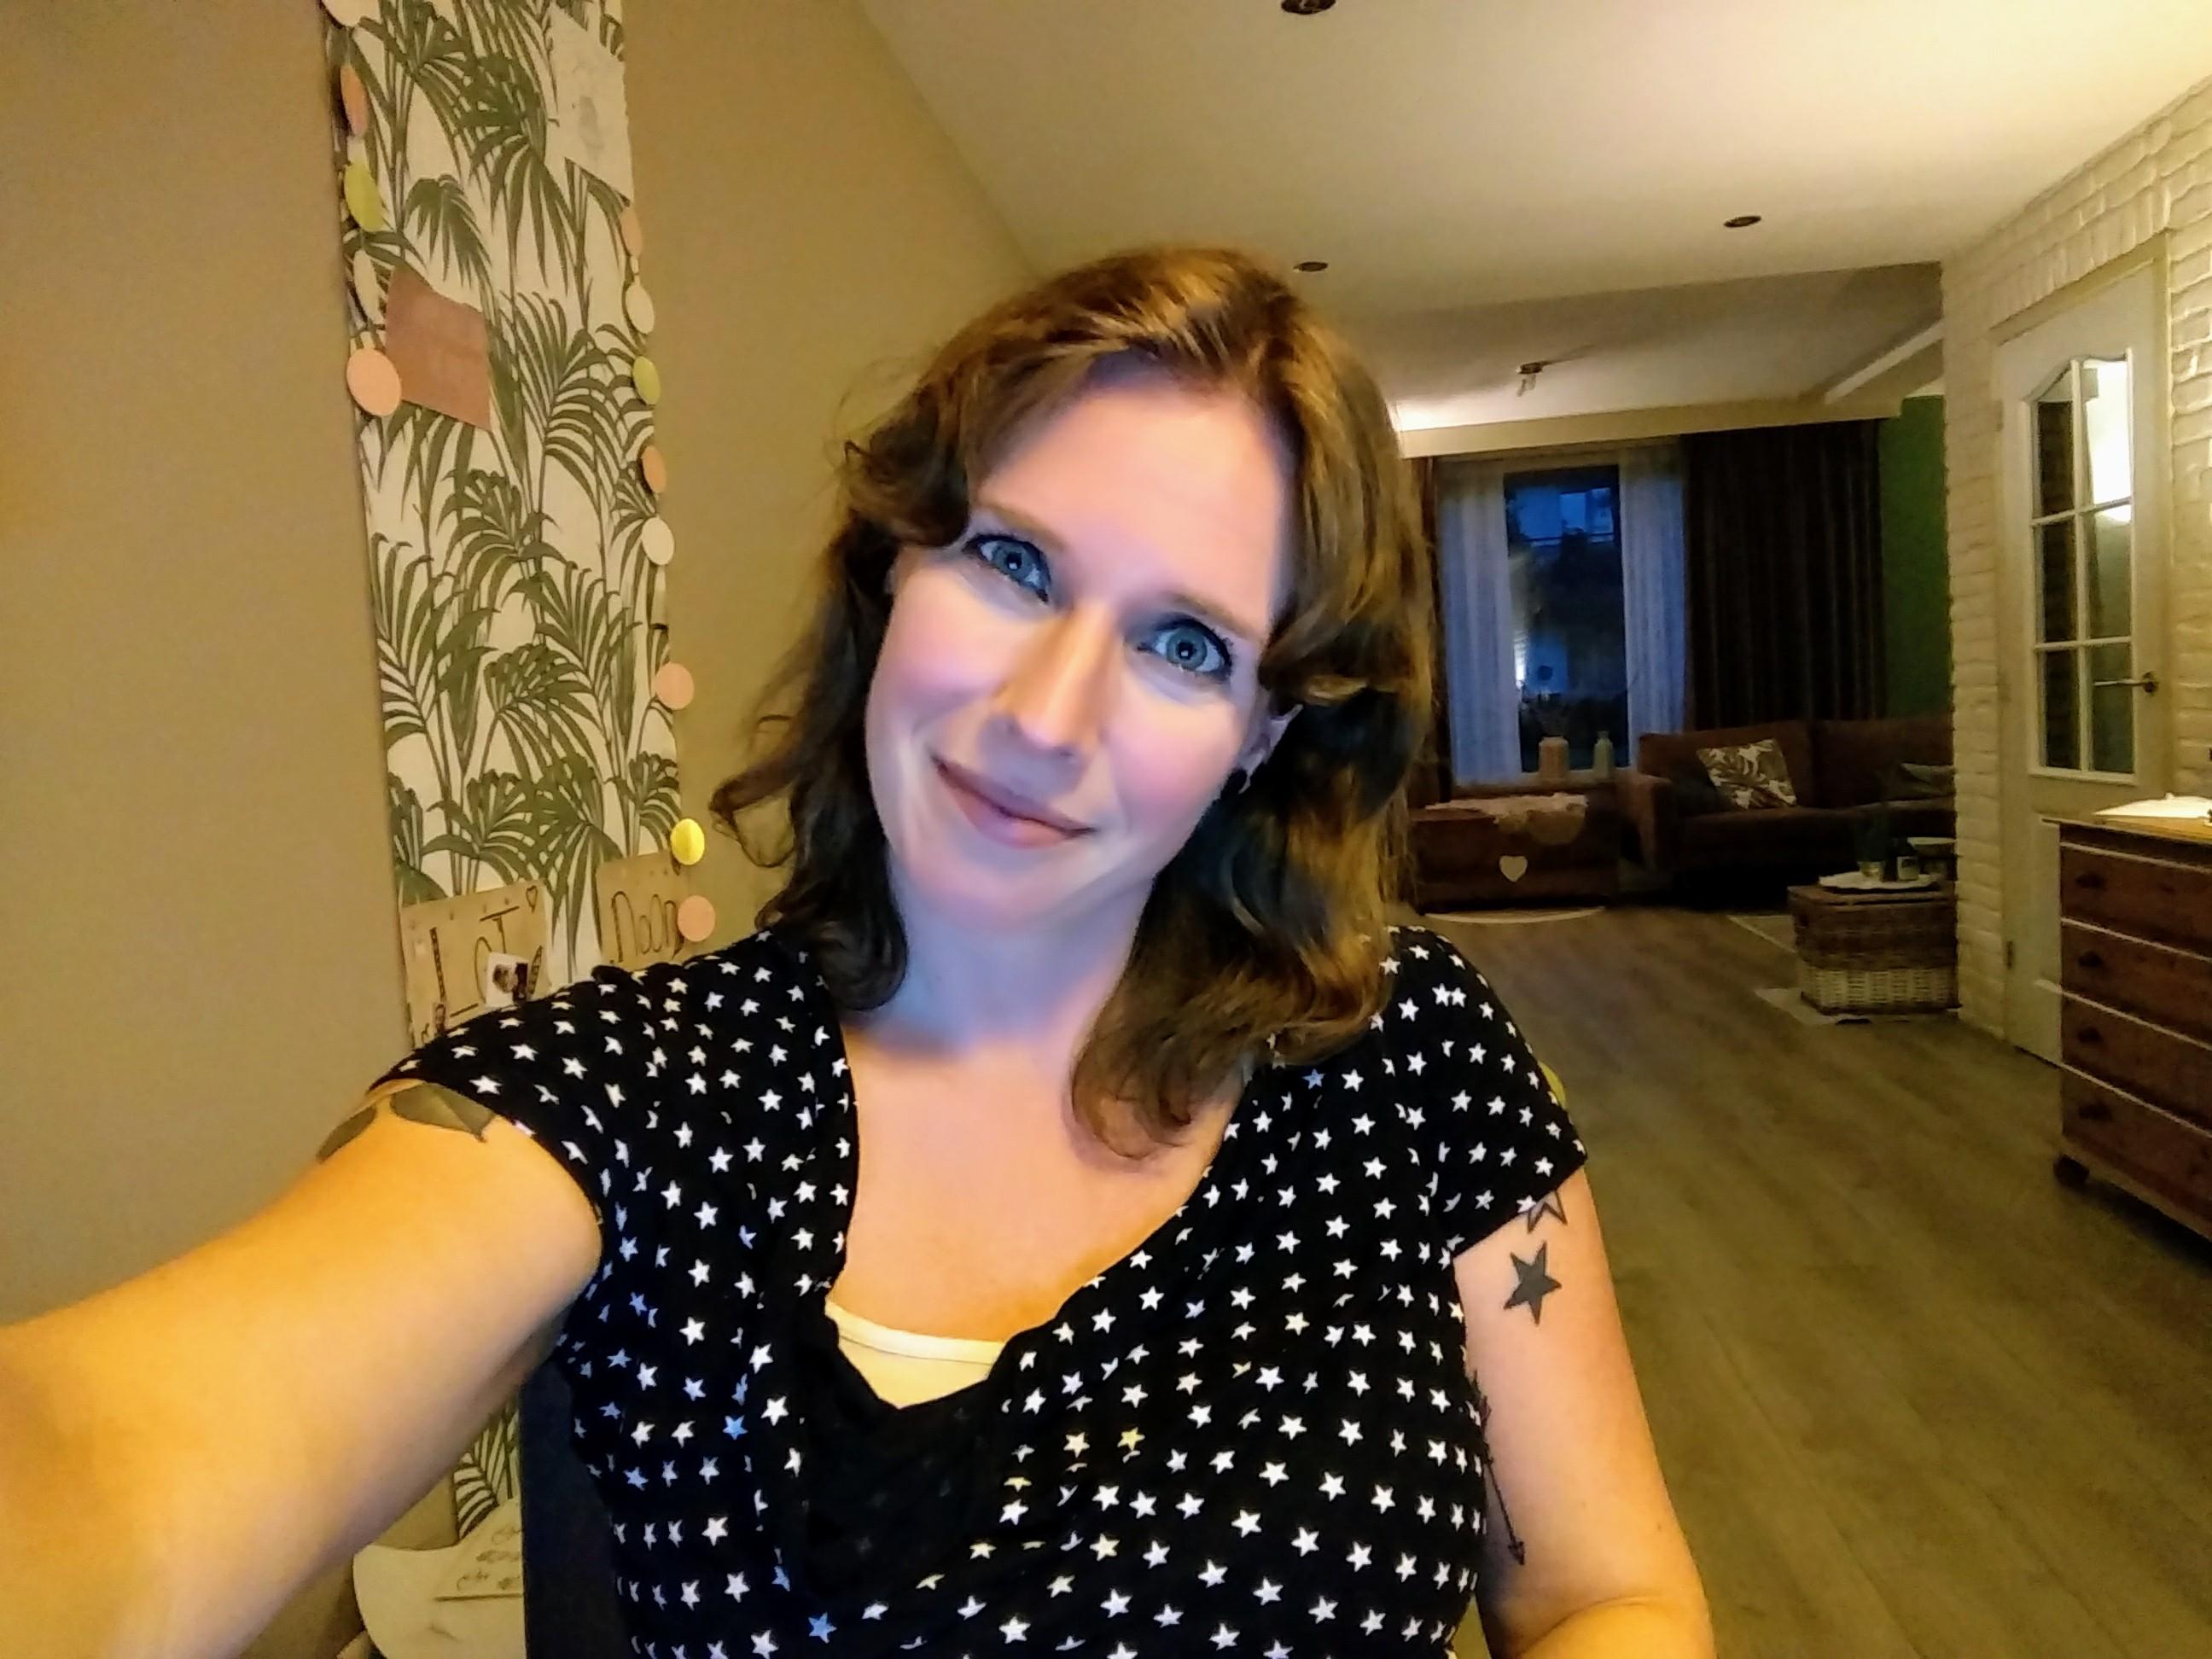 zwanger, mamablog, baby, zwangerschap, derde kindje, voorbereiden baby, blog, lalogblog